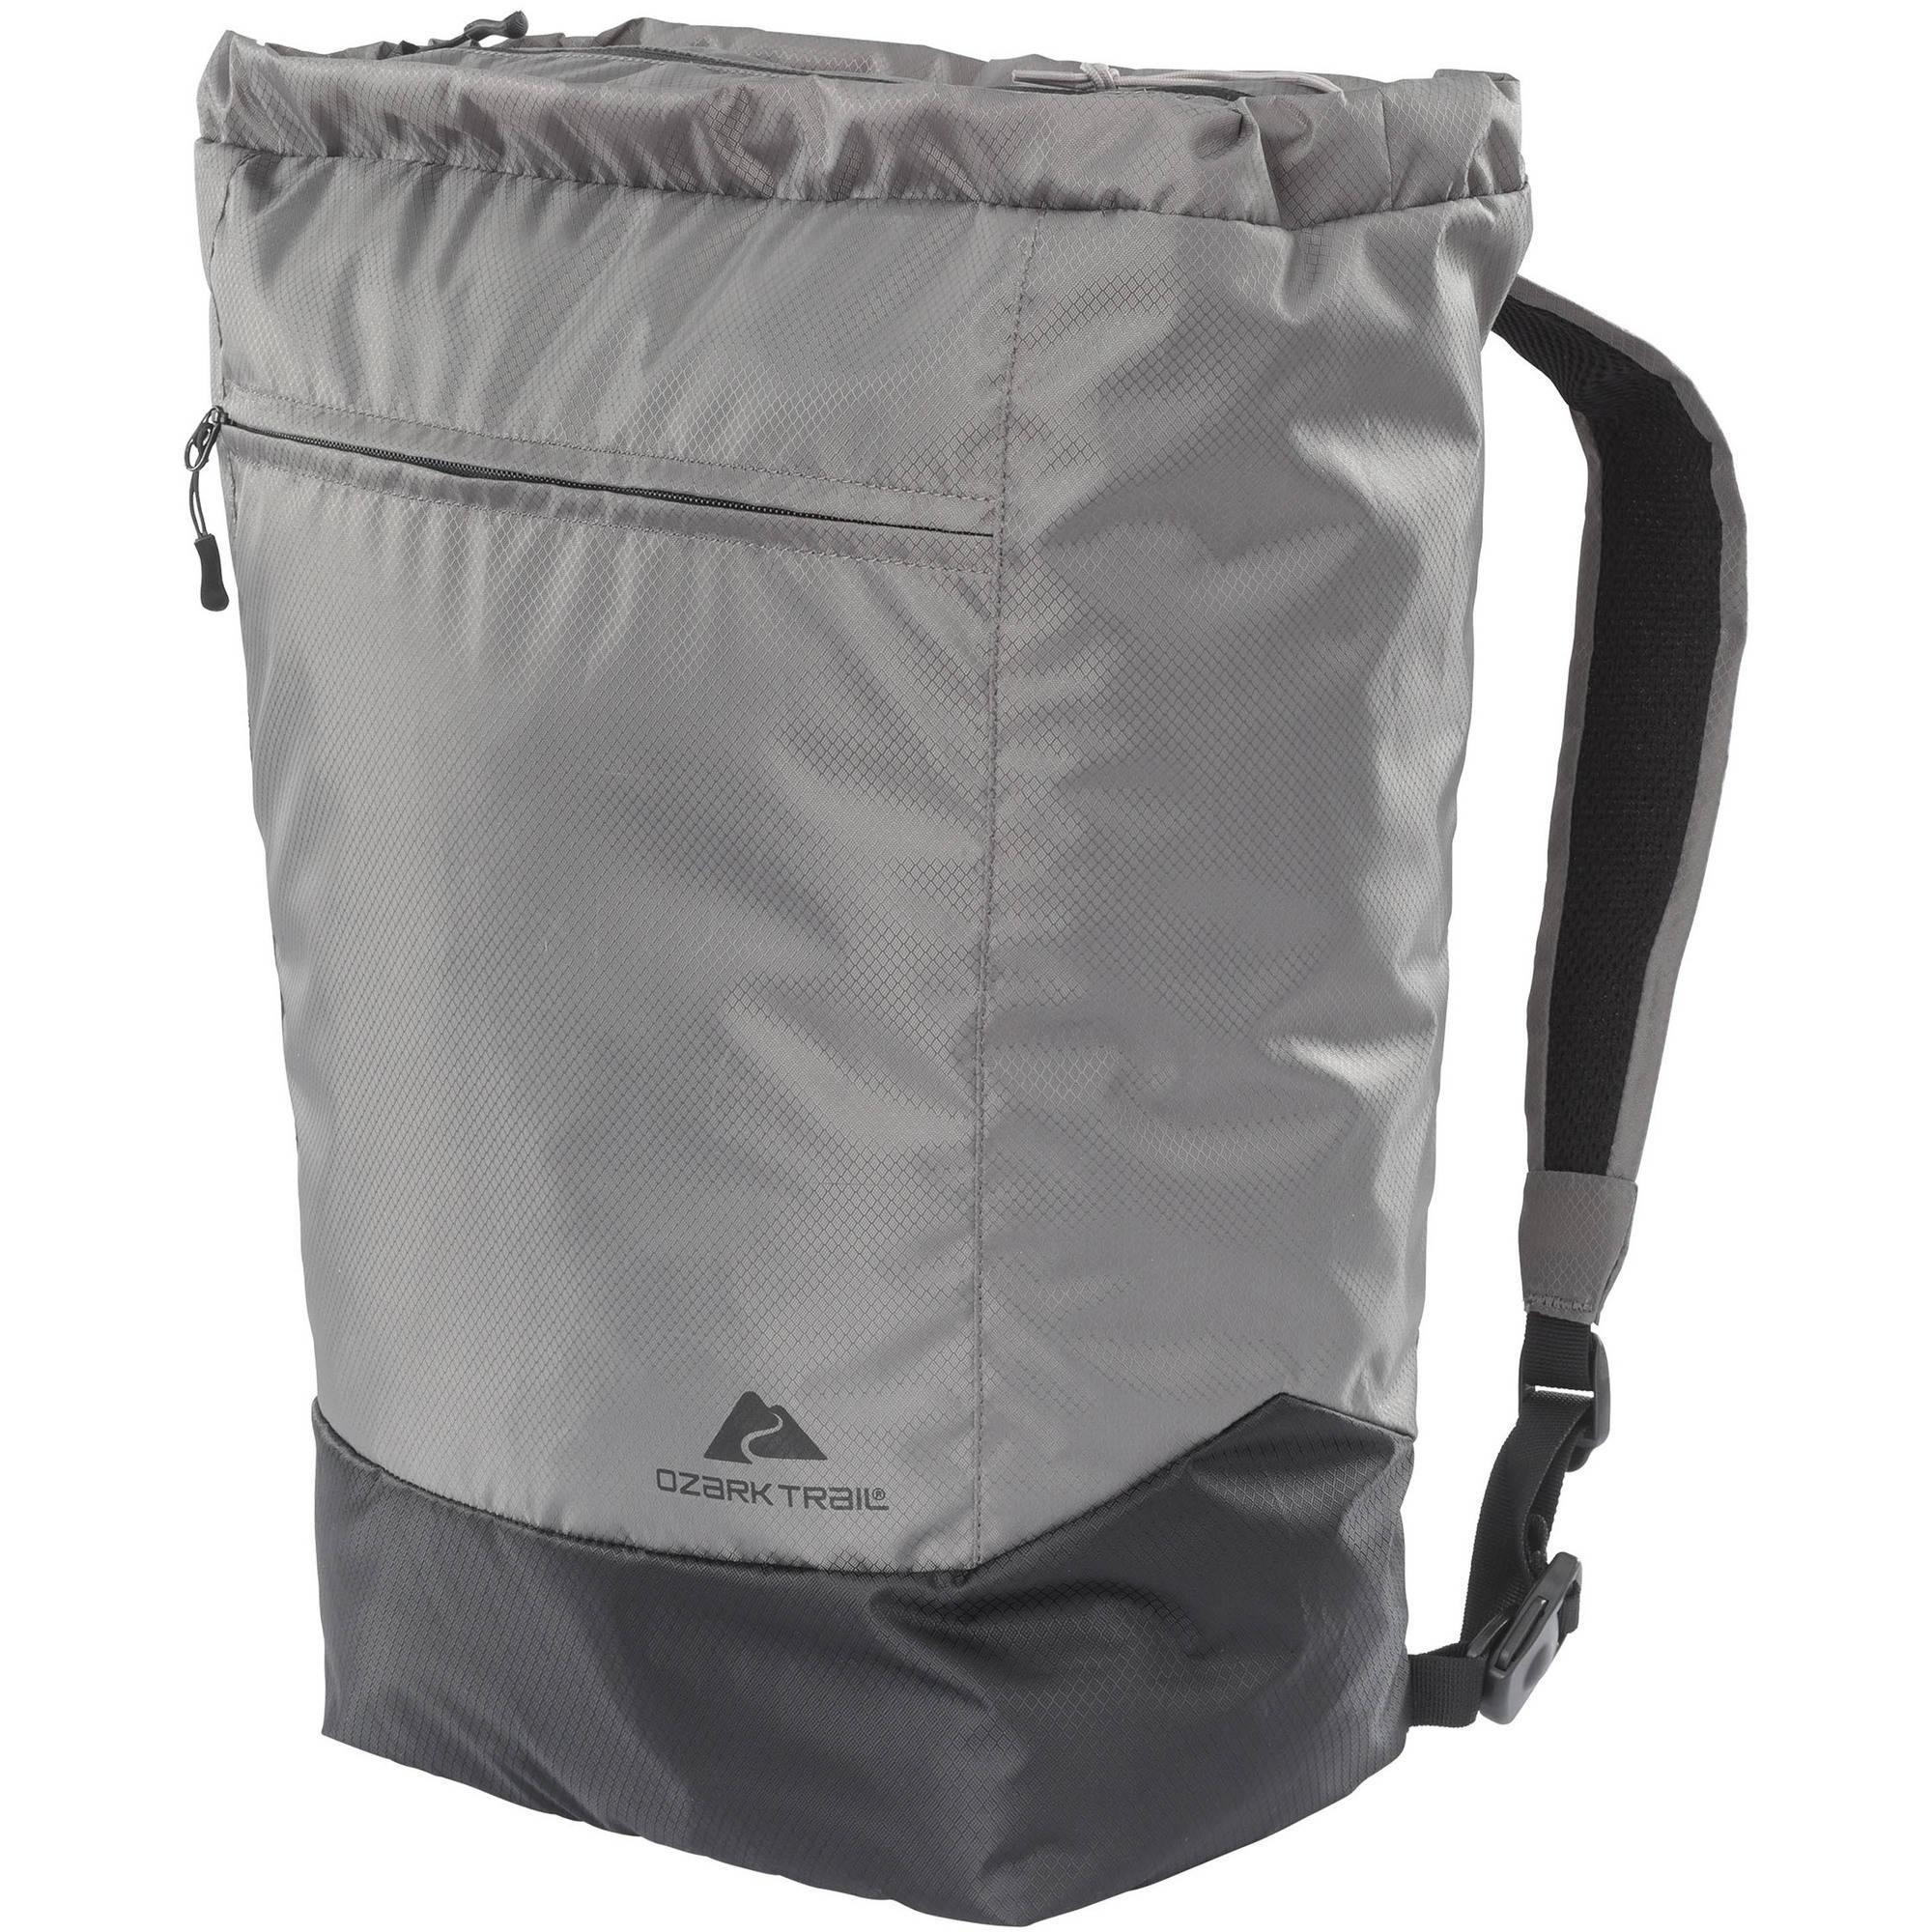 Ozark Trail Stuffable Tote Bag